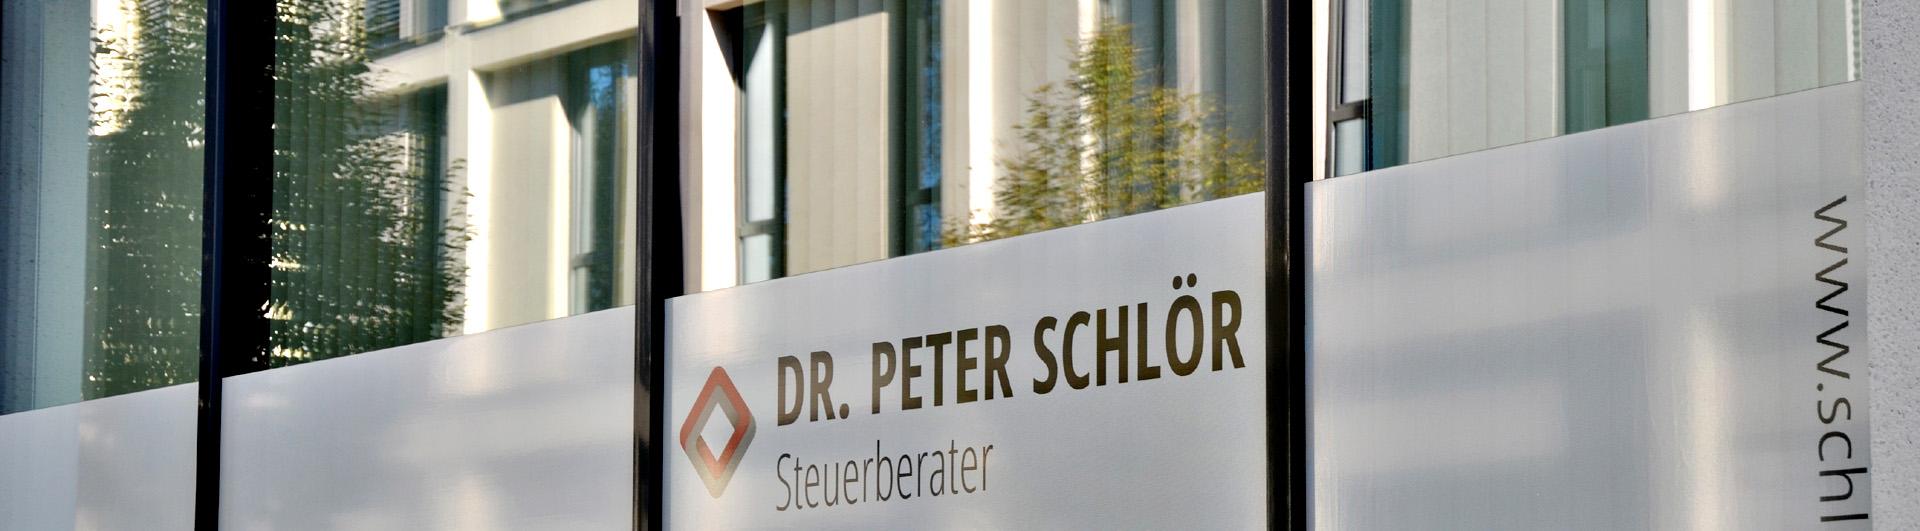 Gebäude Dr. Peter Schlör Steuerberater Heidelberg